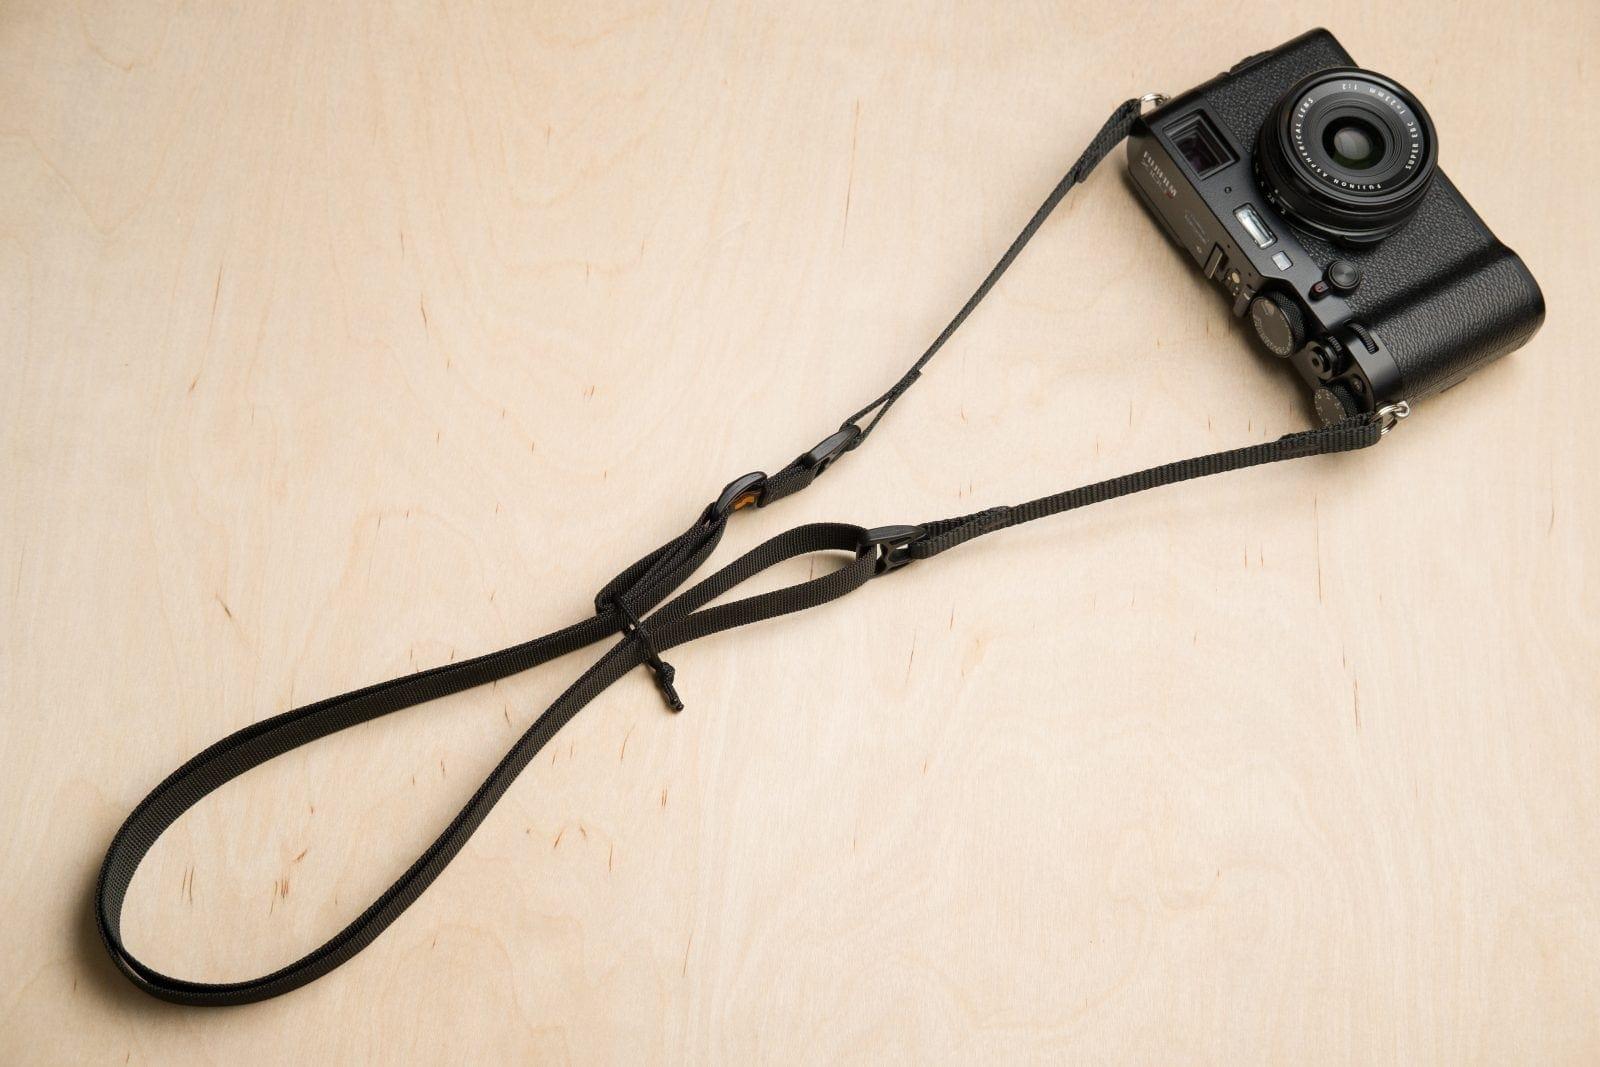 جزئیات محصول تسمه دوربین Simplr F1ultralight